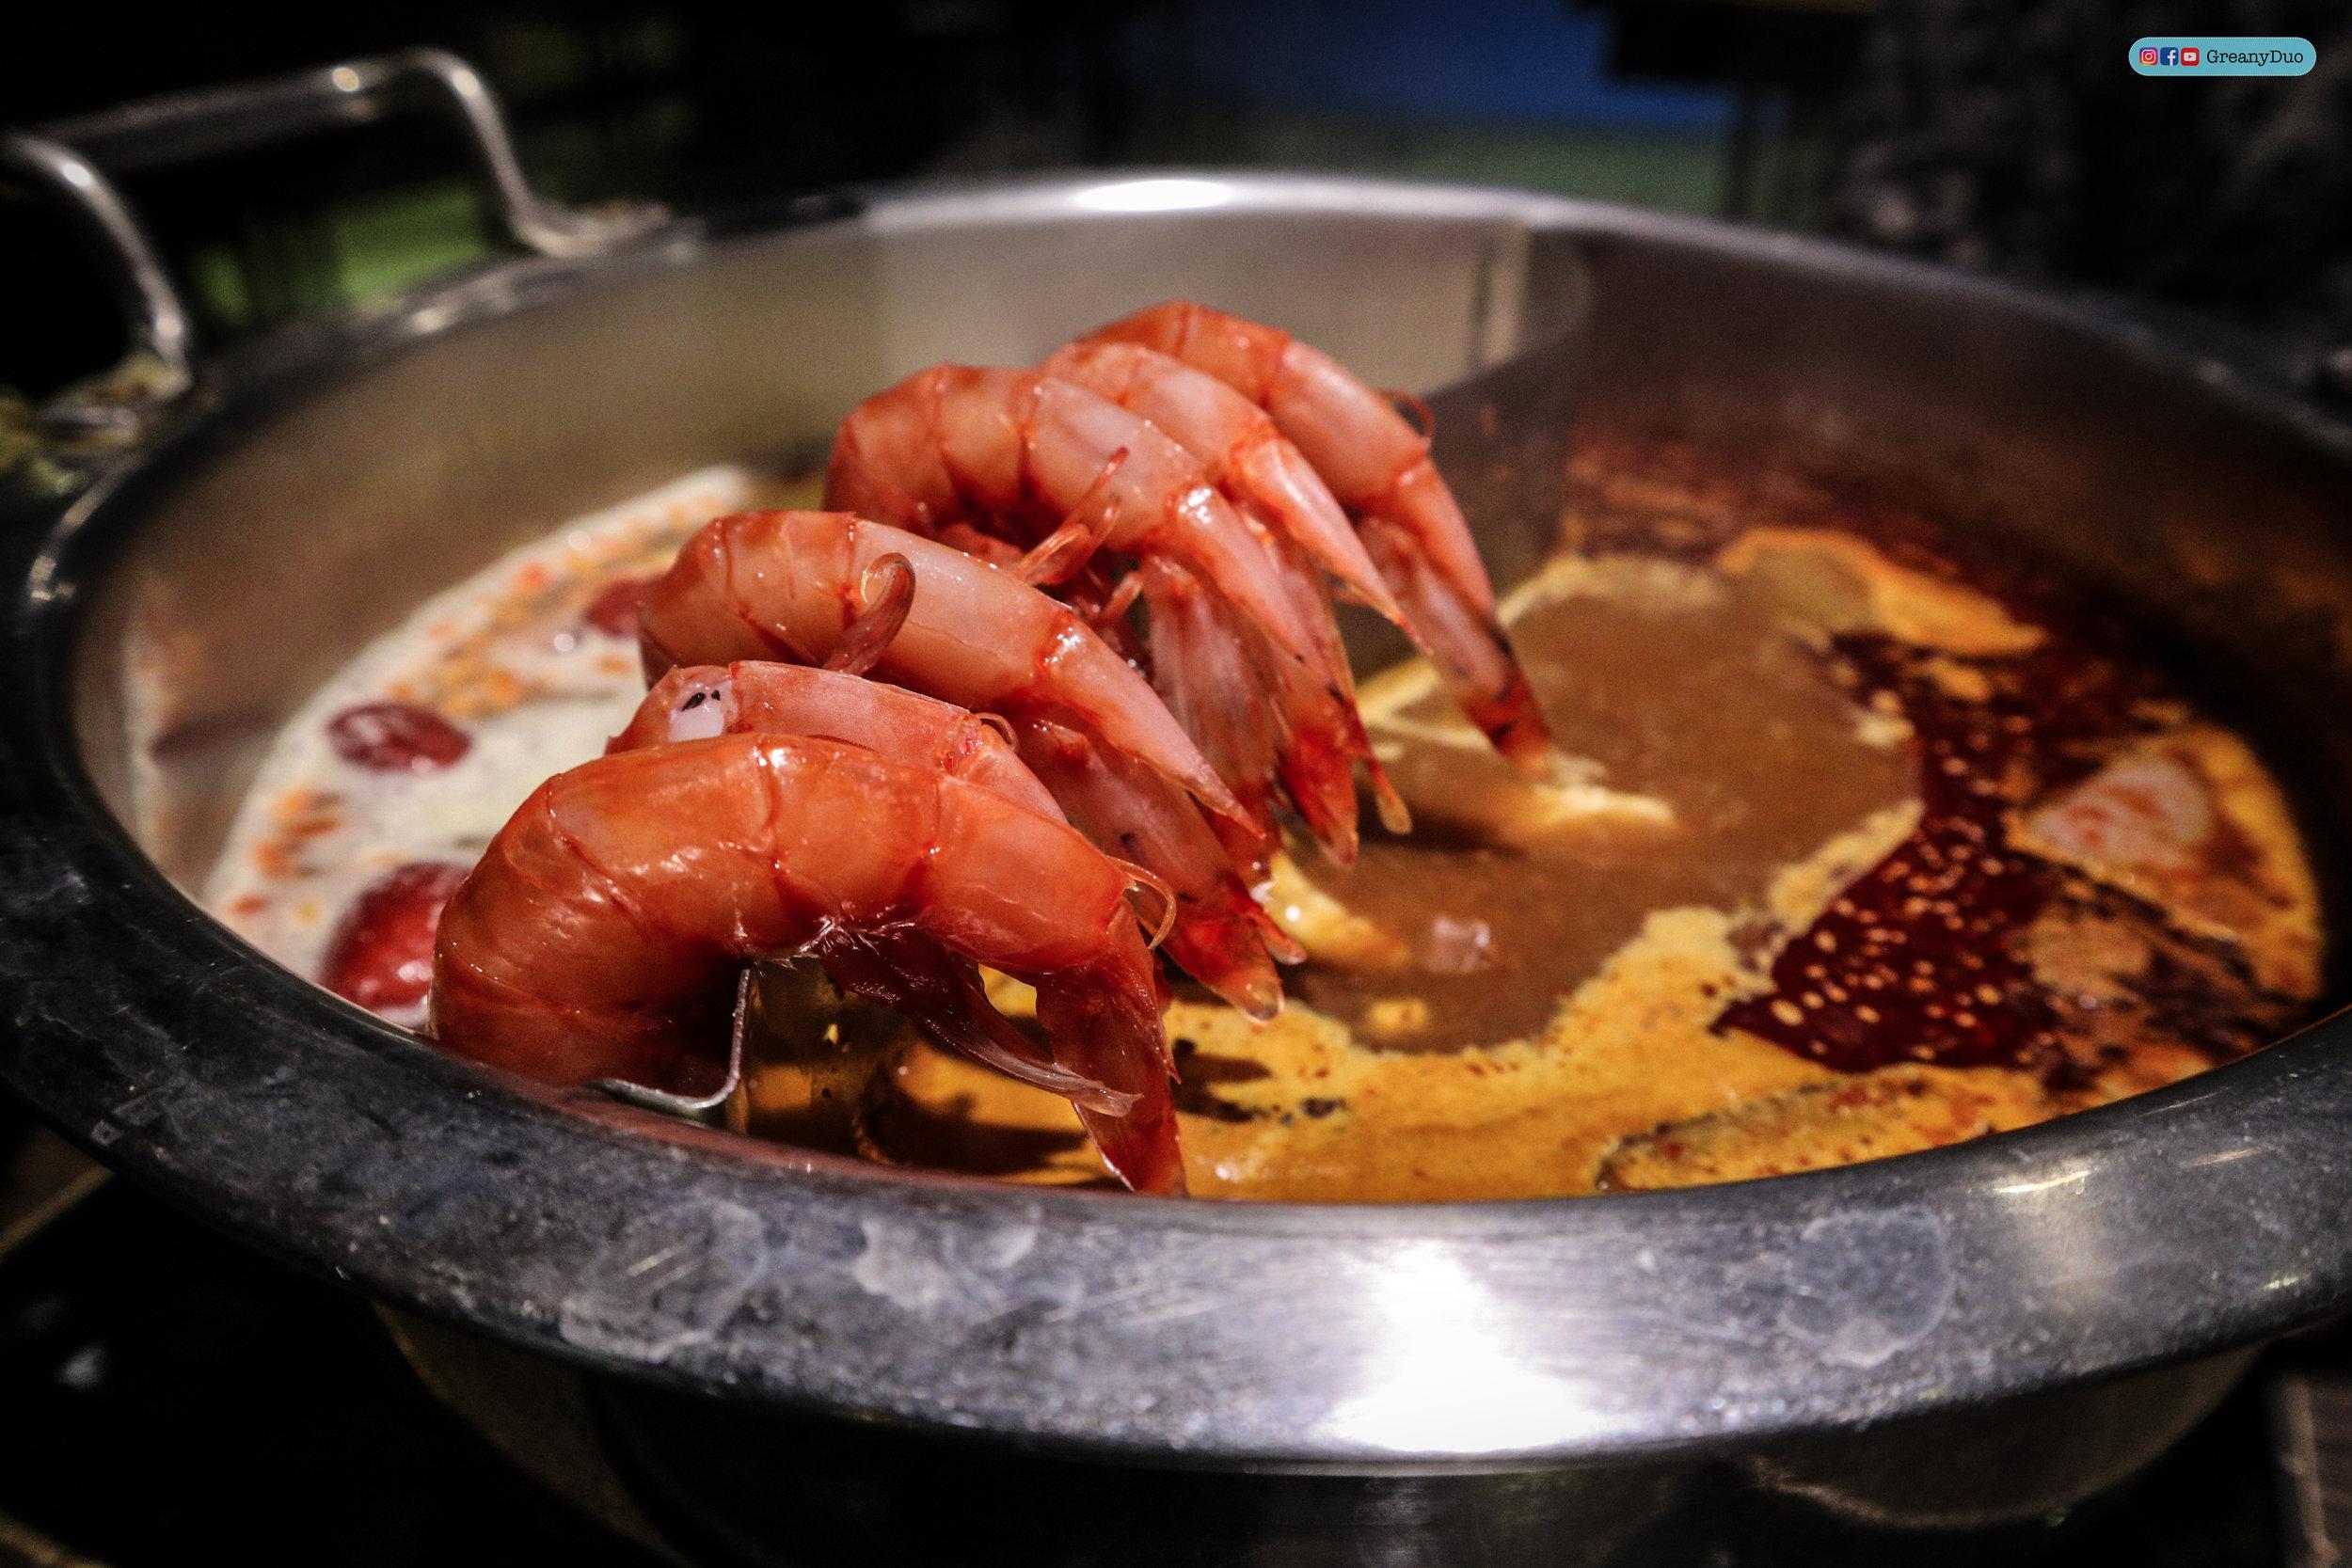 special shrimp at บุฟเฟ่ต์ชาบูไต้หวันที่ Hakkai Shabu Shabu ซีเหมินติง